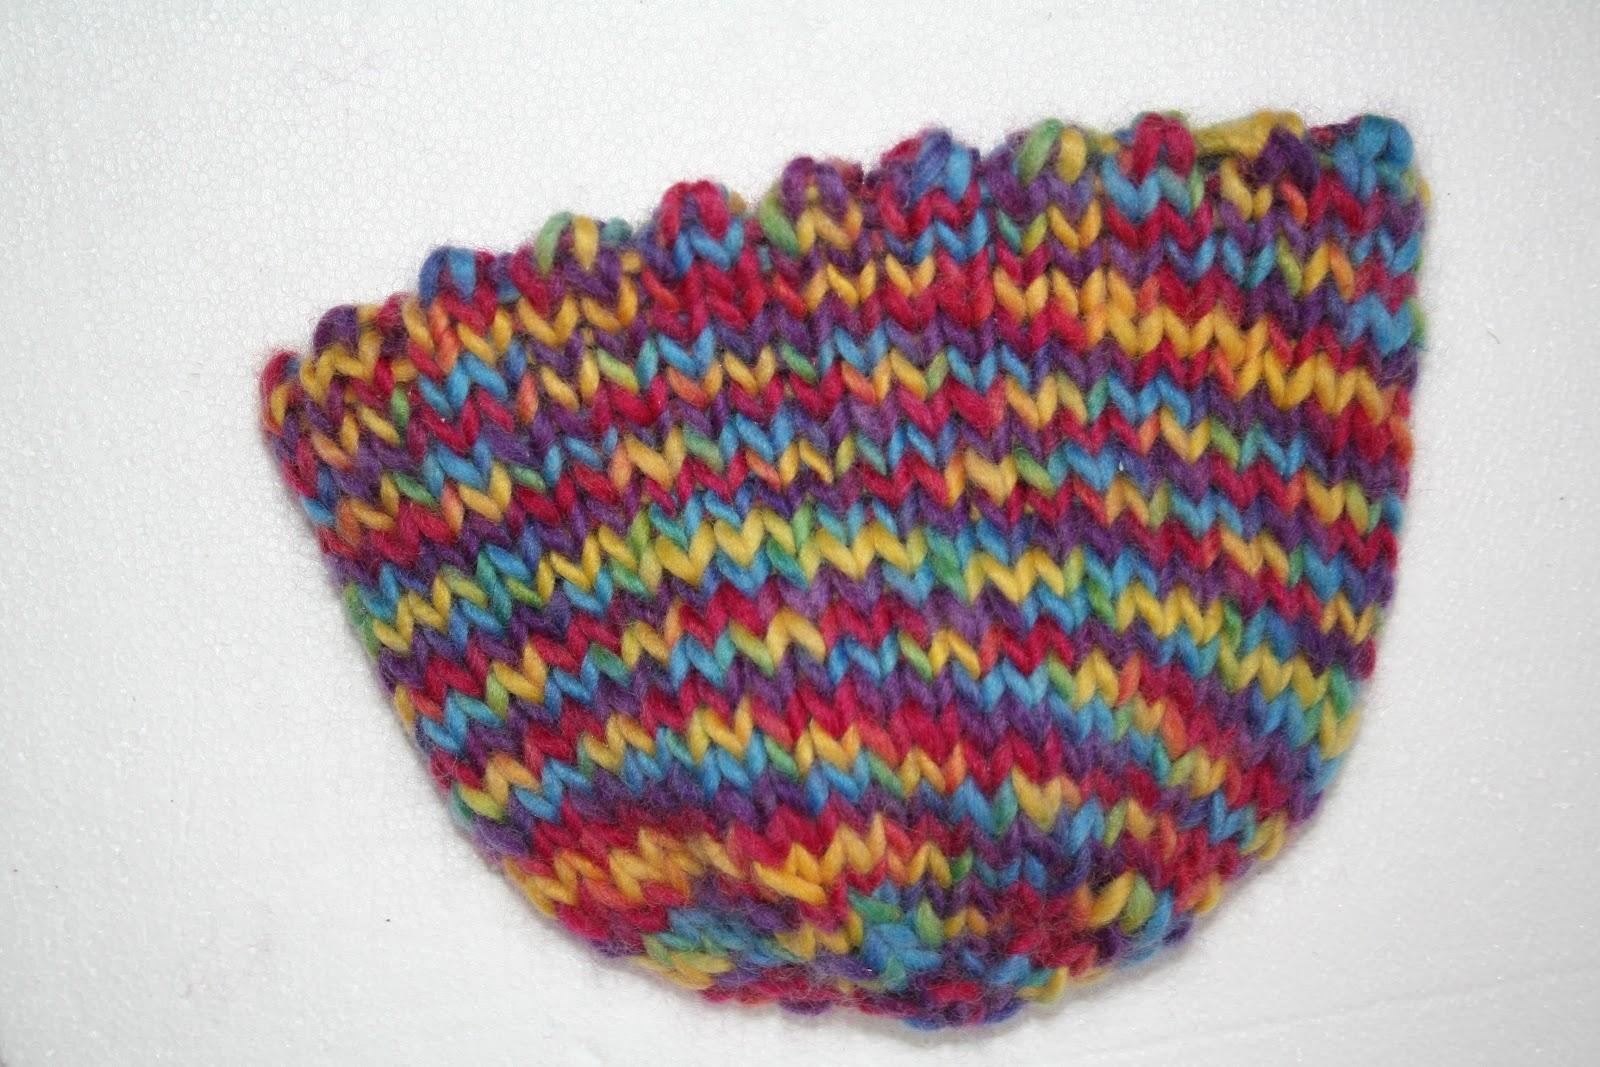 BikerChicKnits: BGITWWW\'s Hand Knit Bowl with Picot Edge